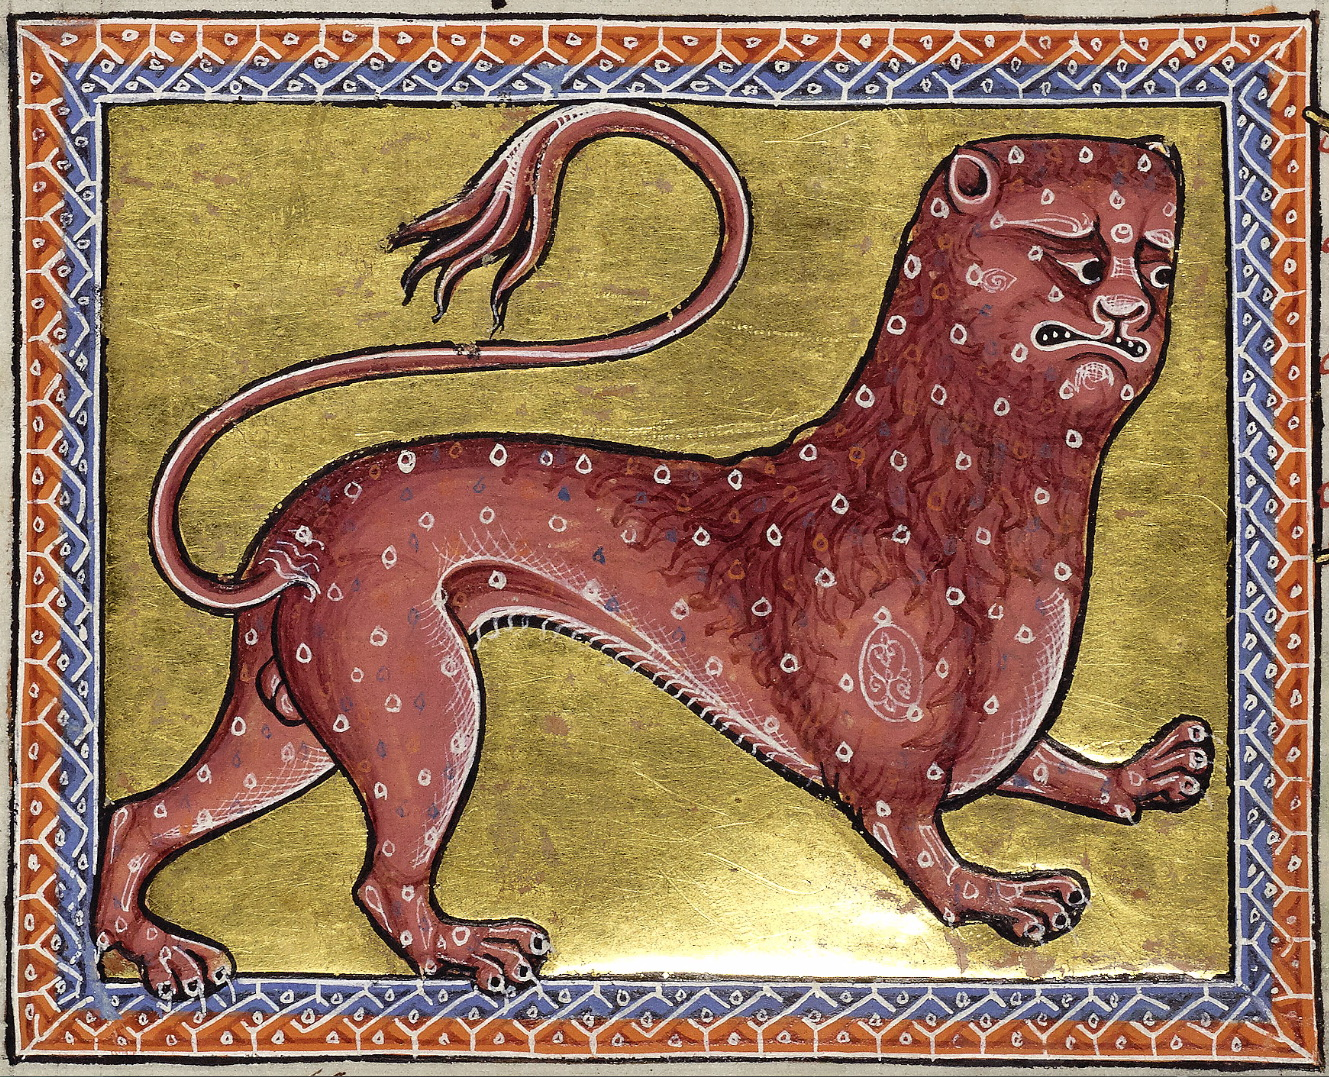 Aberdeen Bestiary, Folio 8 verso, Leopard, 12th century